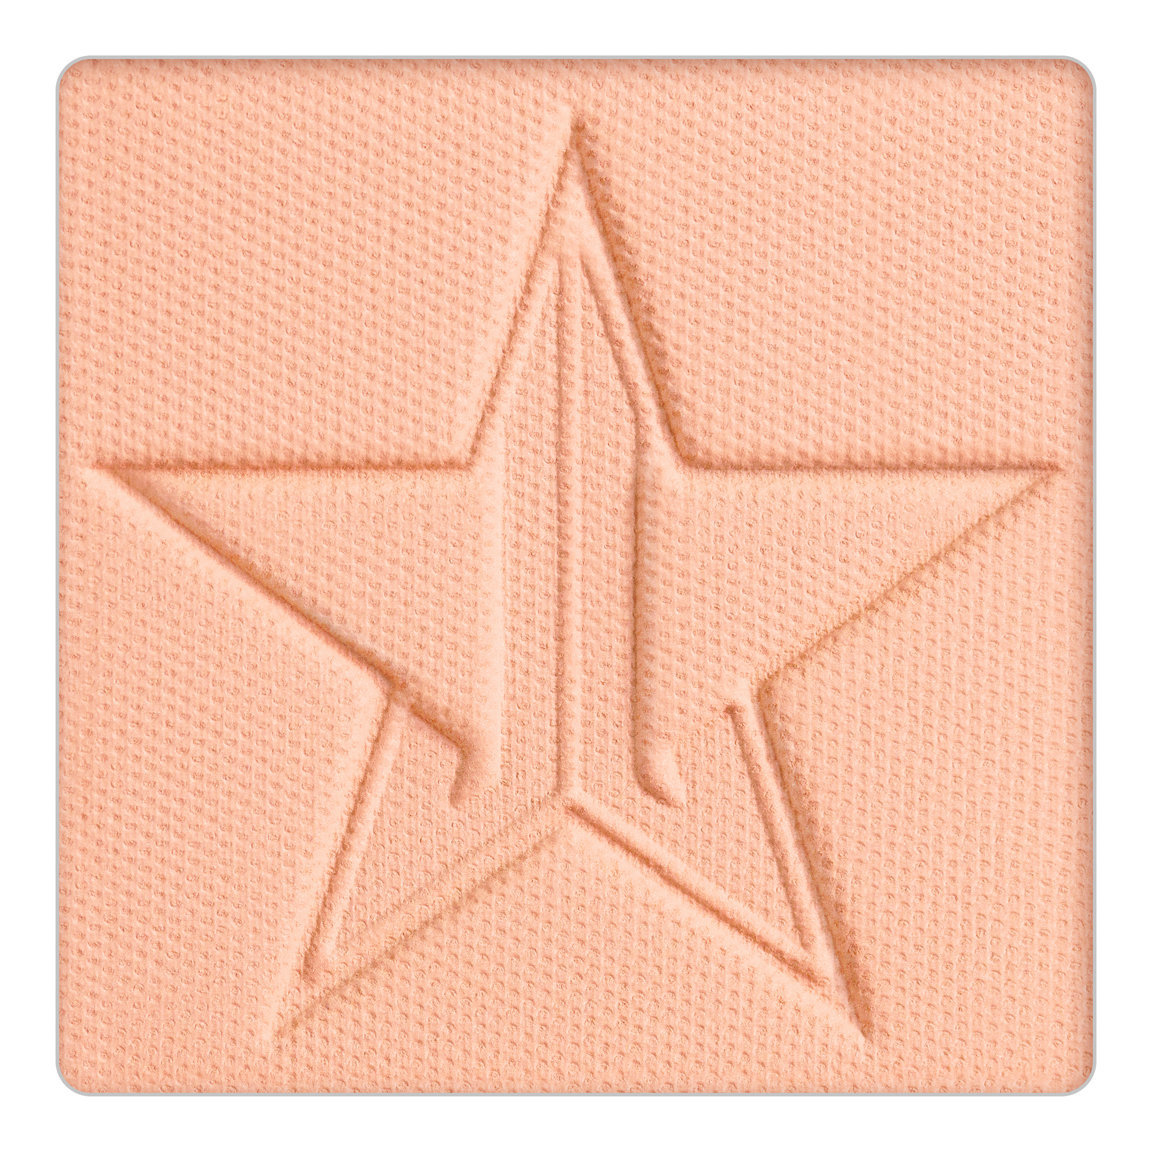 Jeffree Star Cosmetics Artistry Singles Cone alternative view 1.